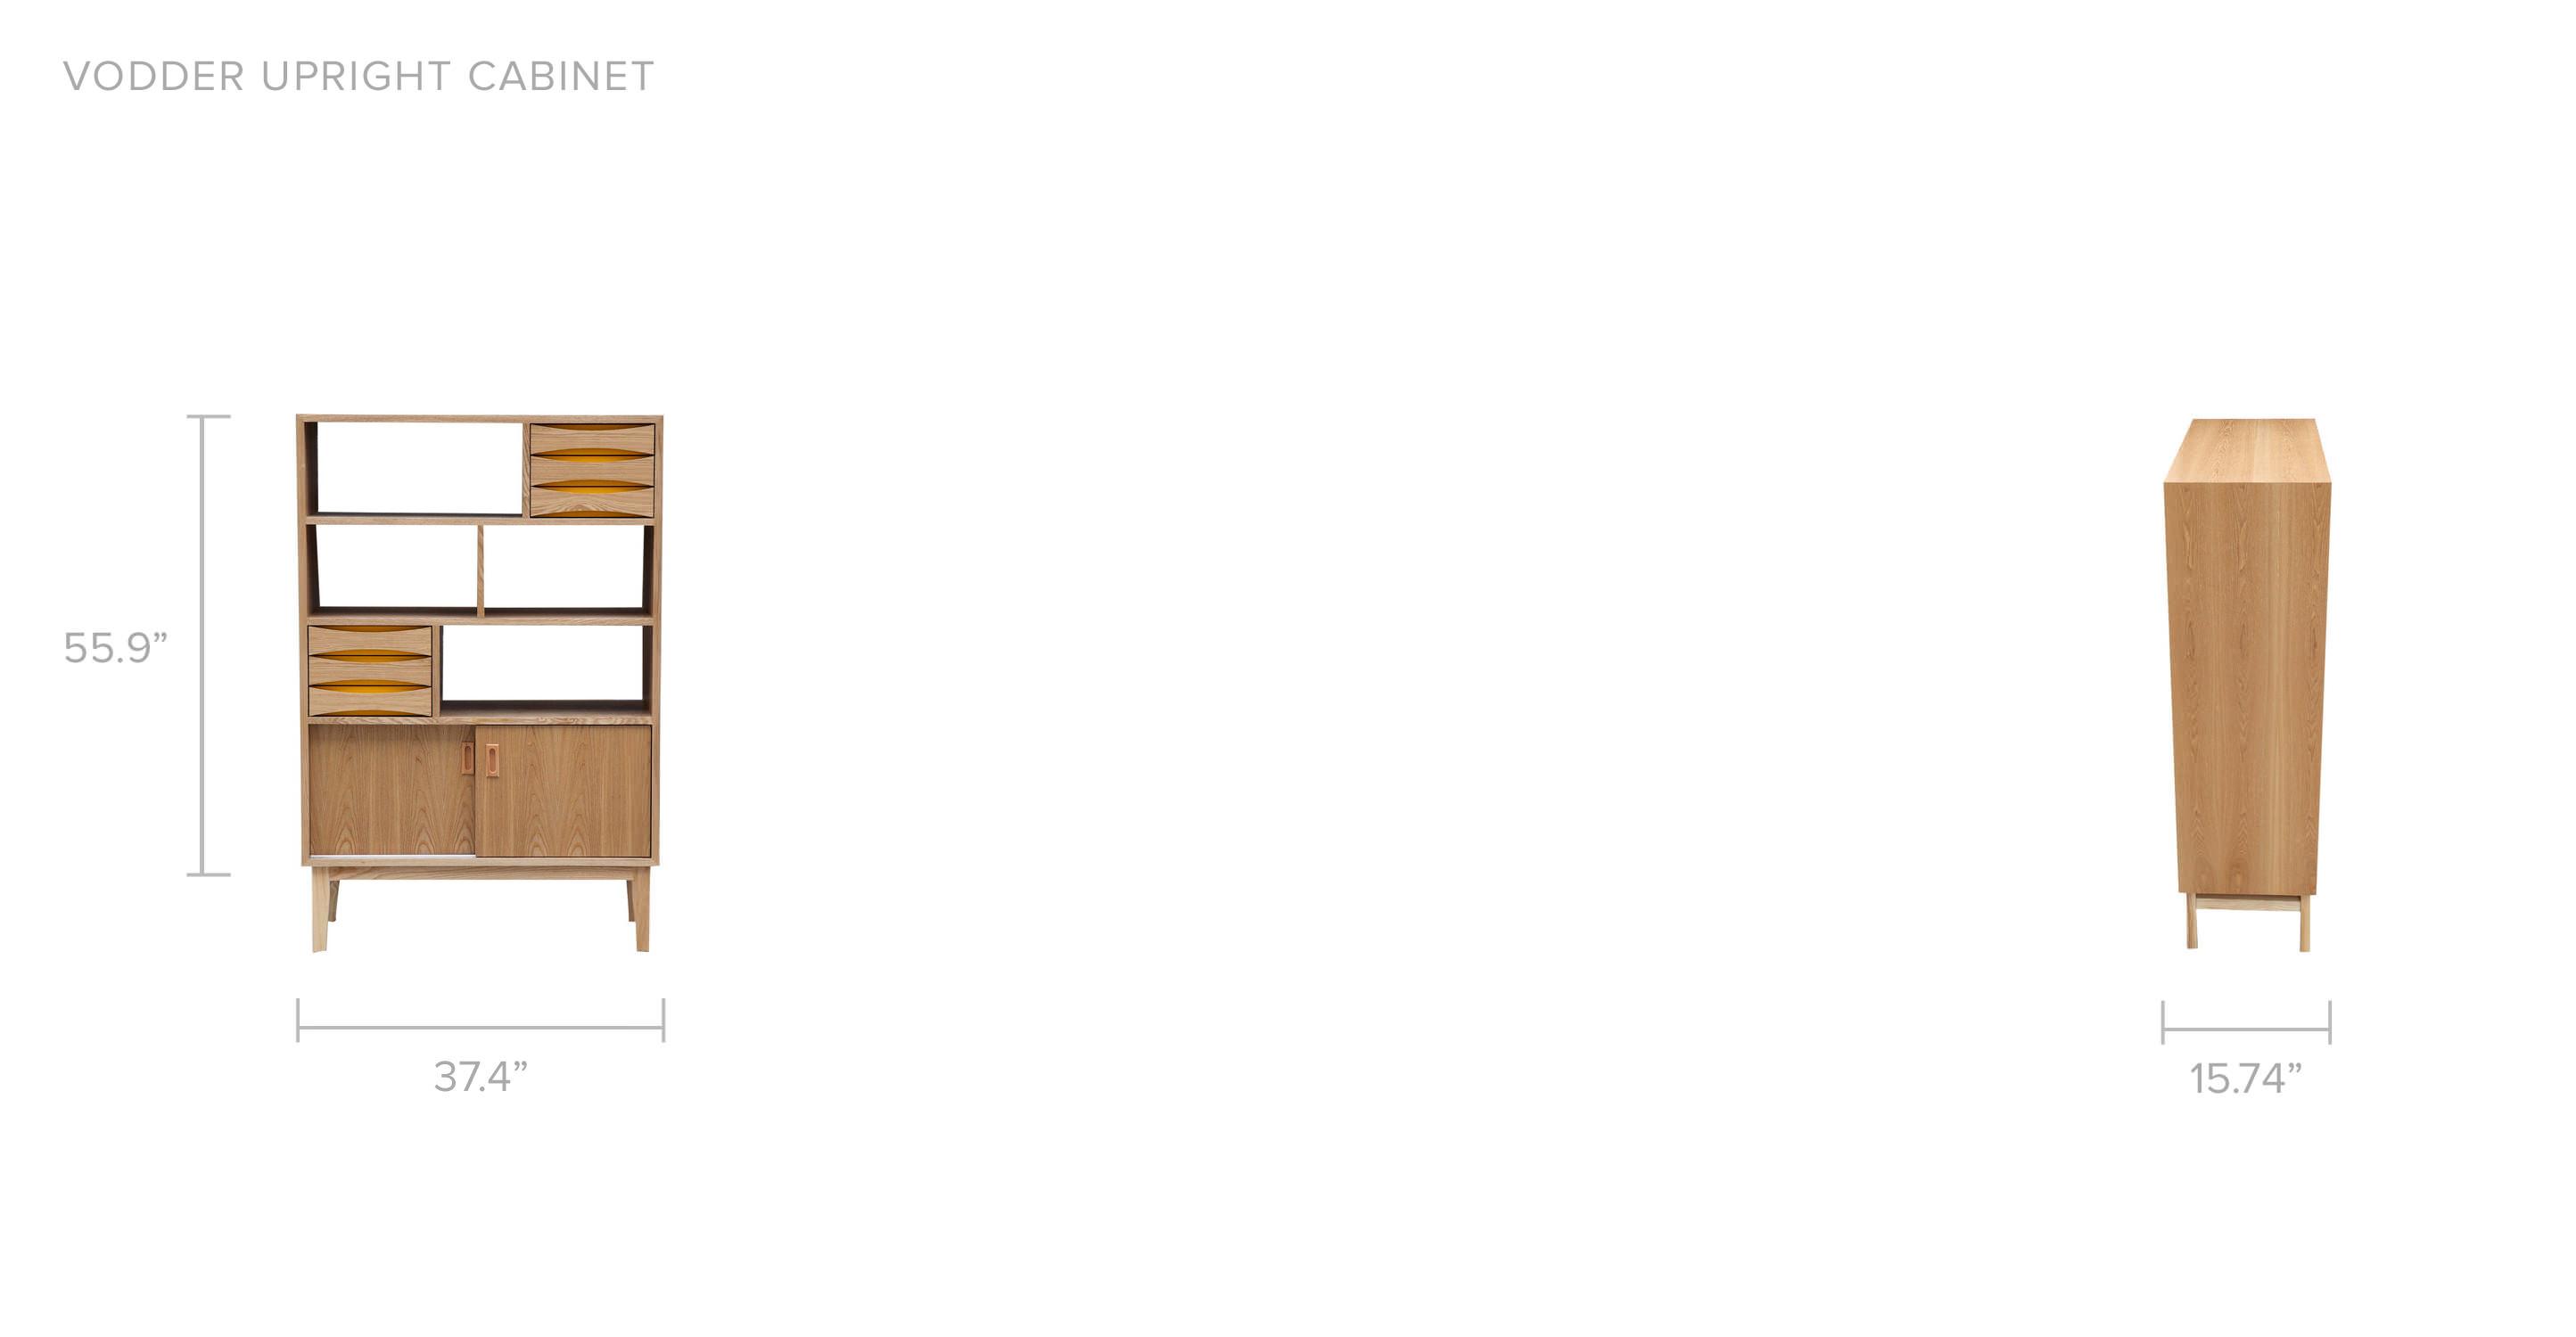 drawings-vodder-uprightcabinet.jpg